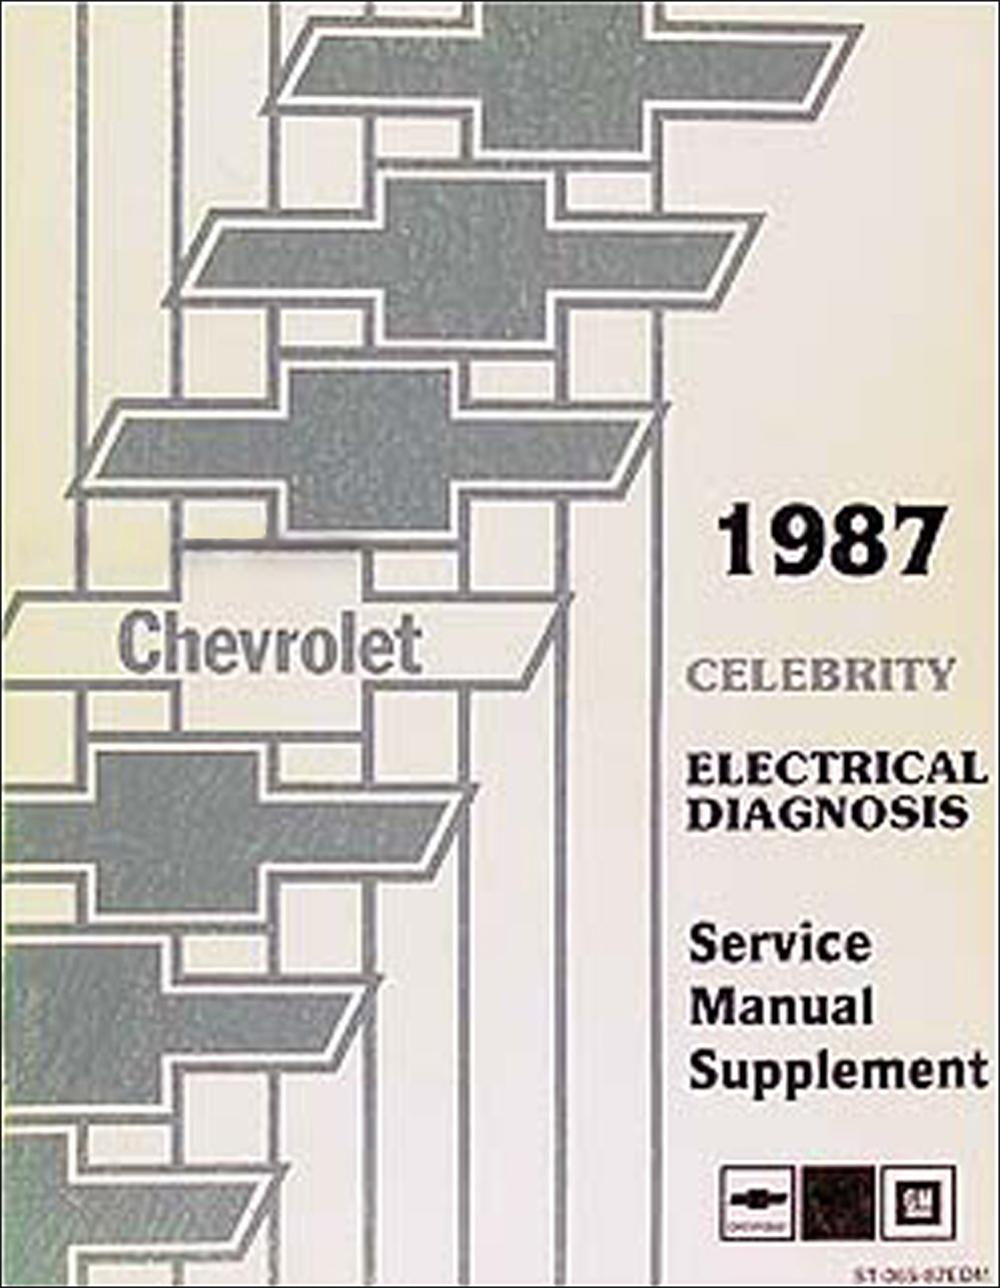 Chevy Celebrity Wiring Diagram Circuit Schematic 1987 Electrical Diagnosis Manual Original Diagrams Automotive